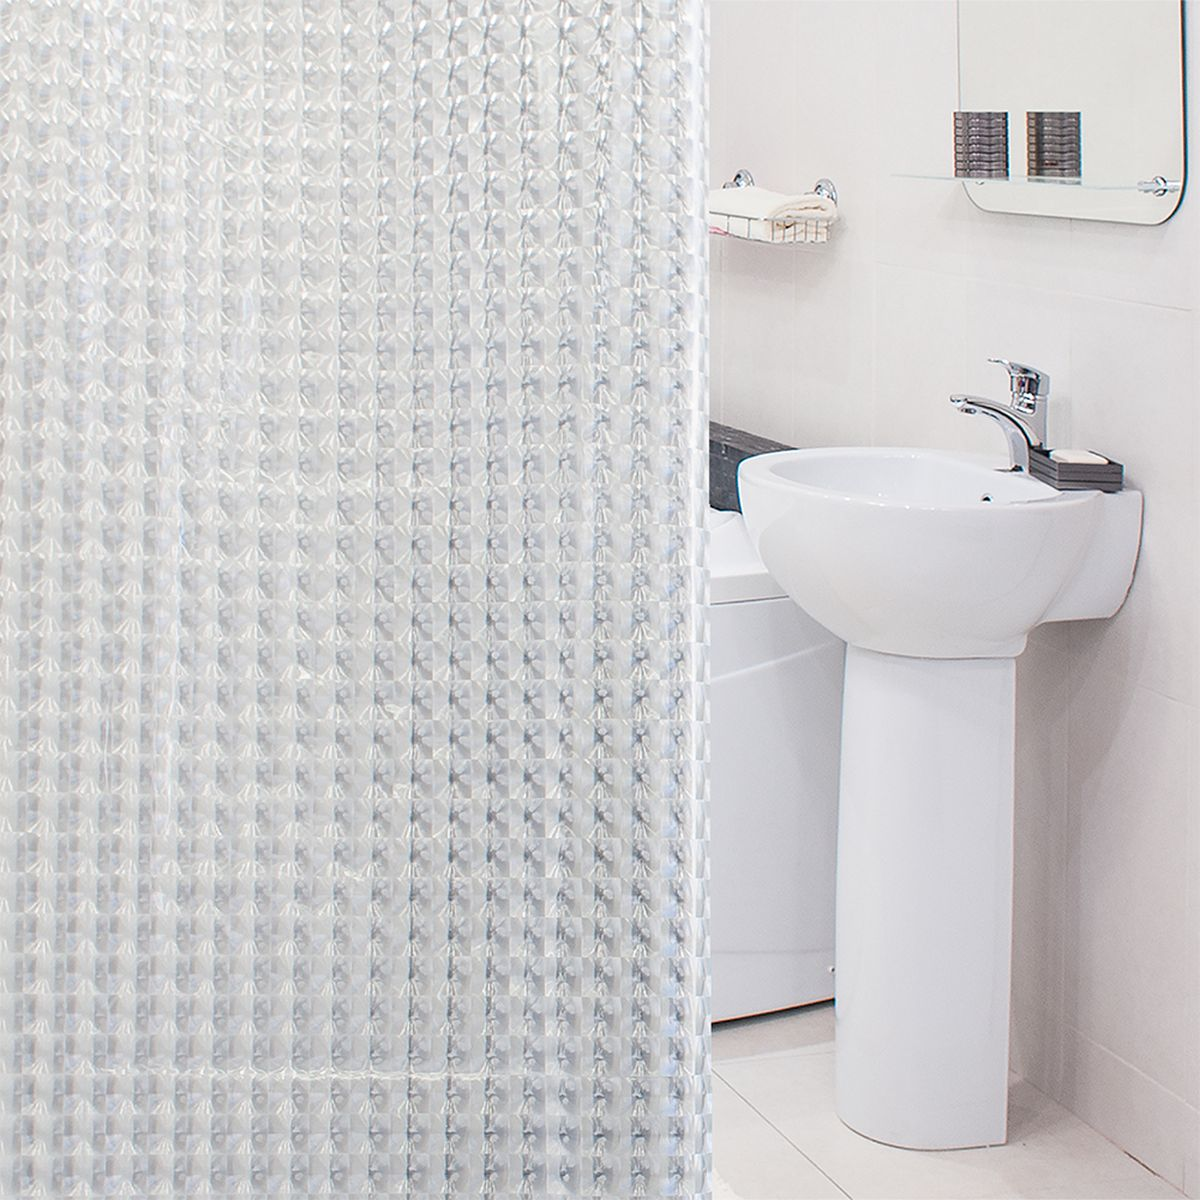 Штора для ванной комнаты 3D Tatkraft Crystal, с кольцами, 180 х 180 см крючок двойной tatkraft mega lock на вакуумном шурупе